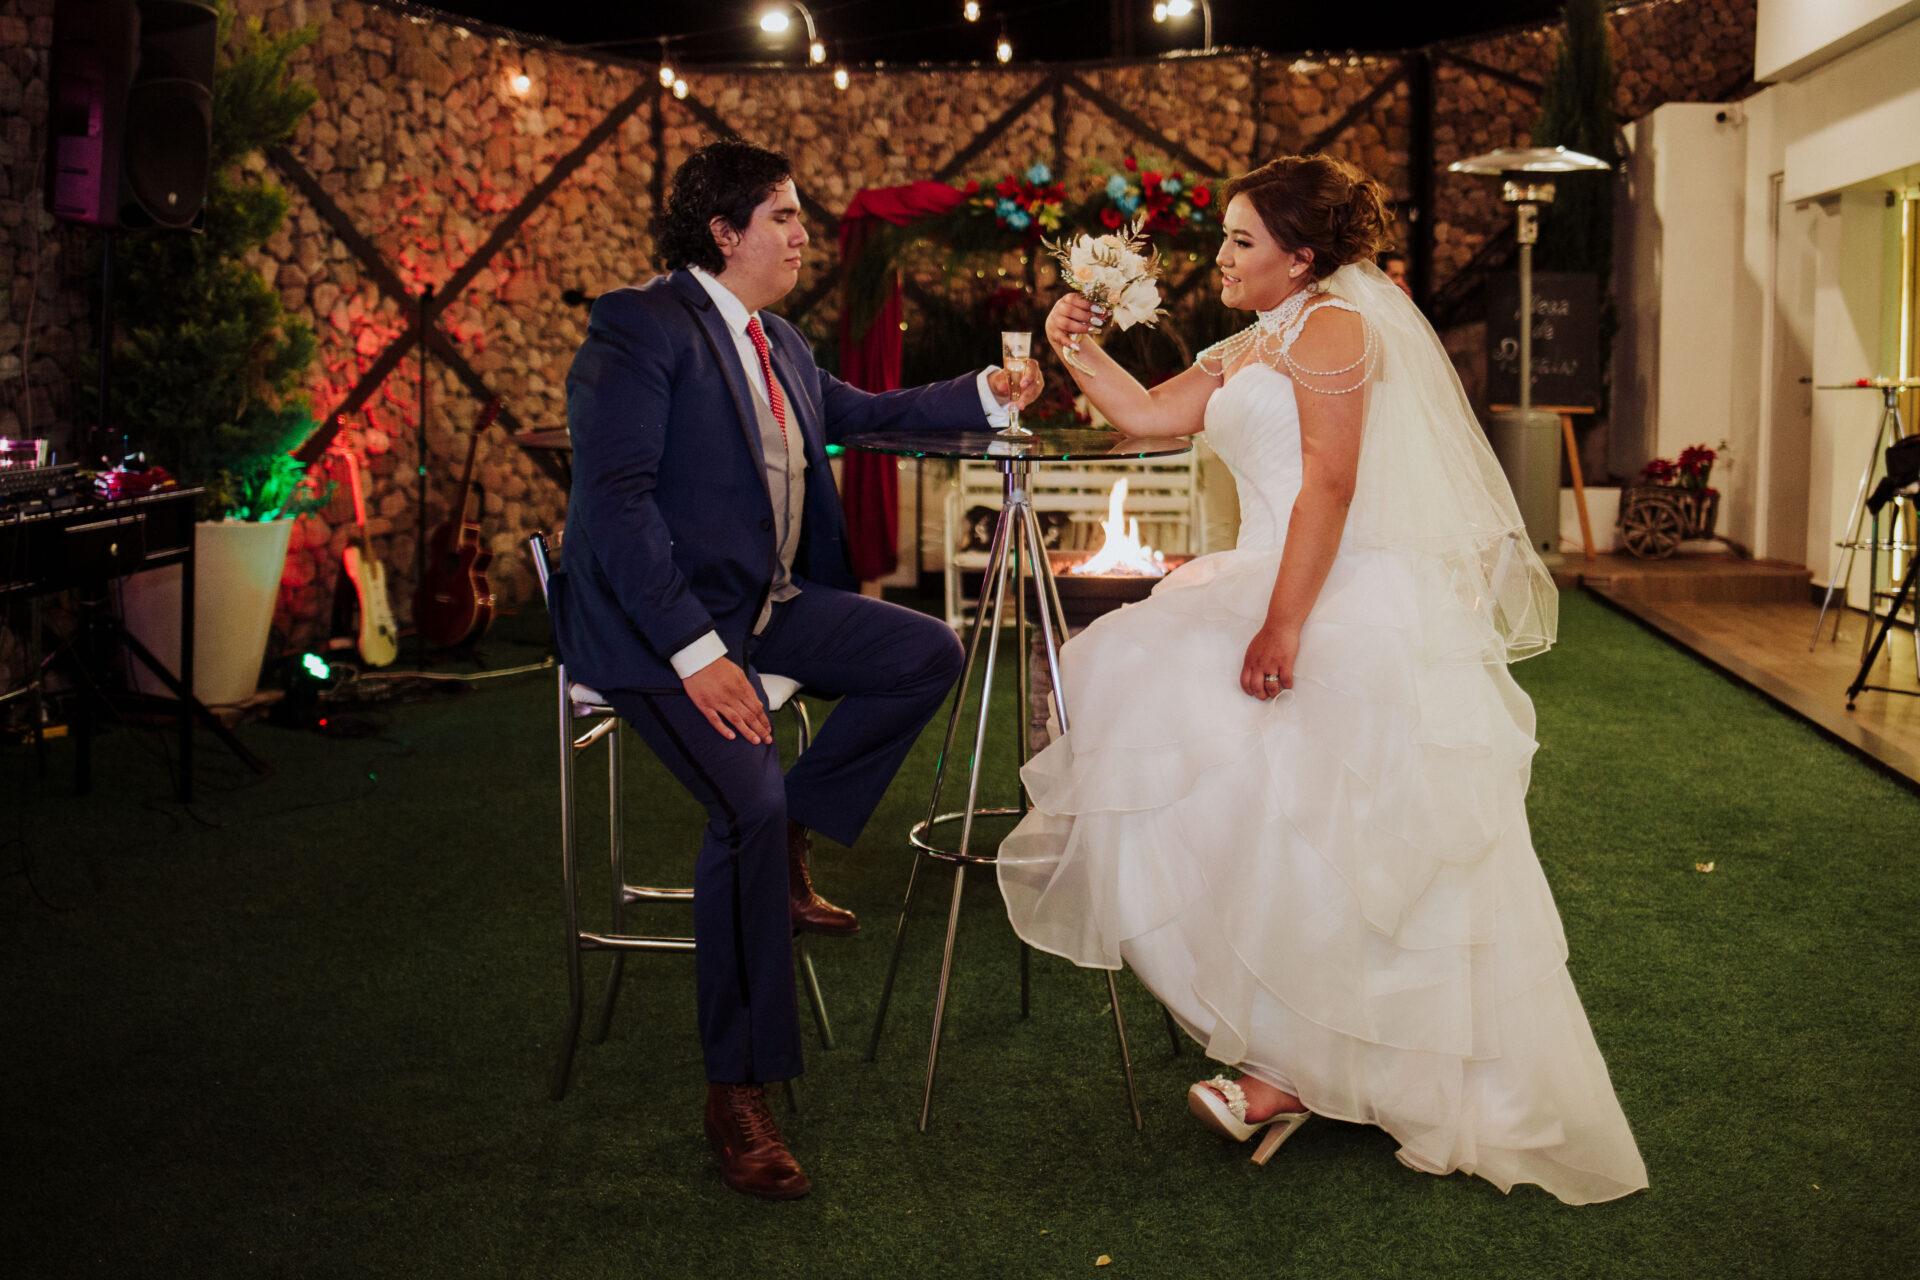 javier_noriega_fotografo_bodas_gaviones_zacatecas_wedding_photographer38